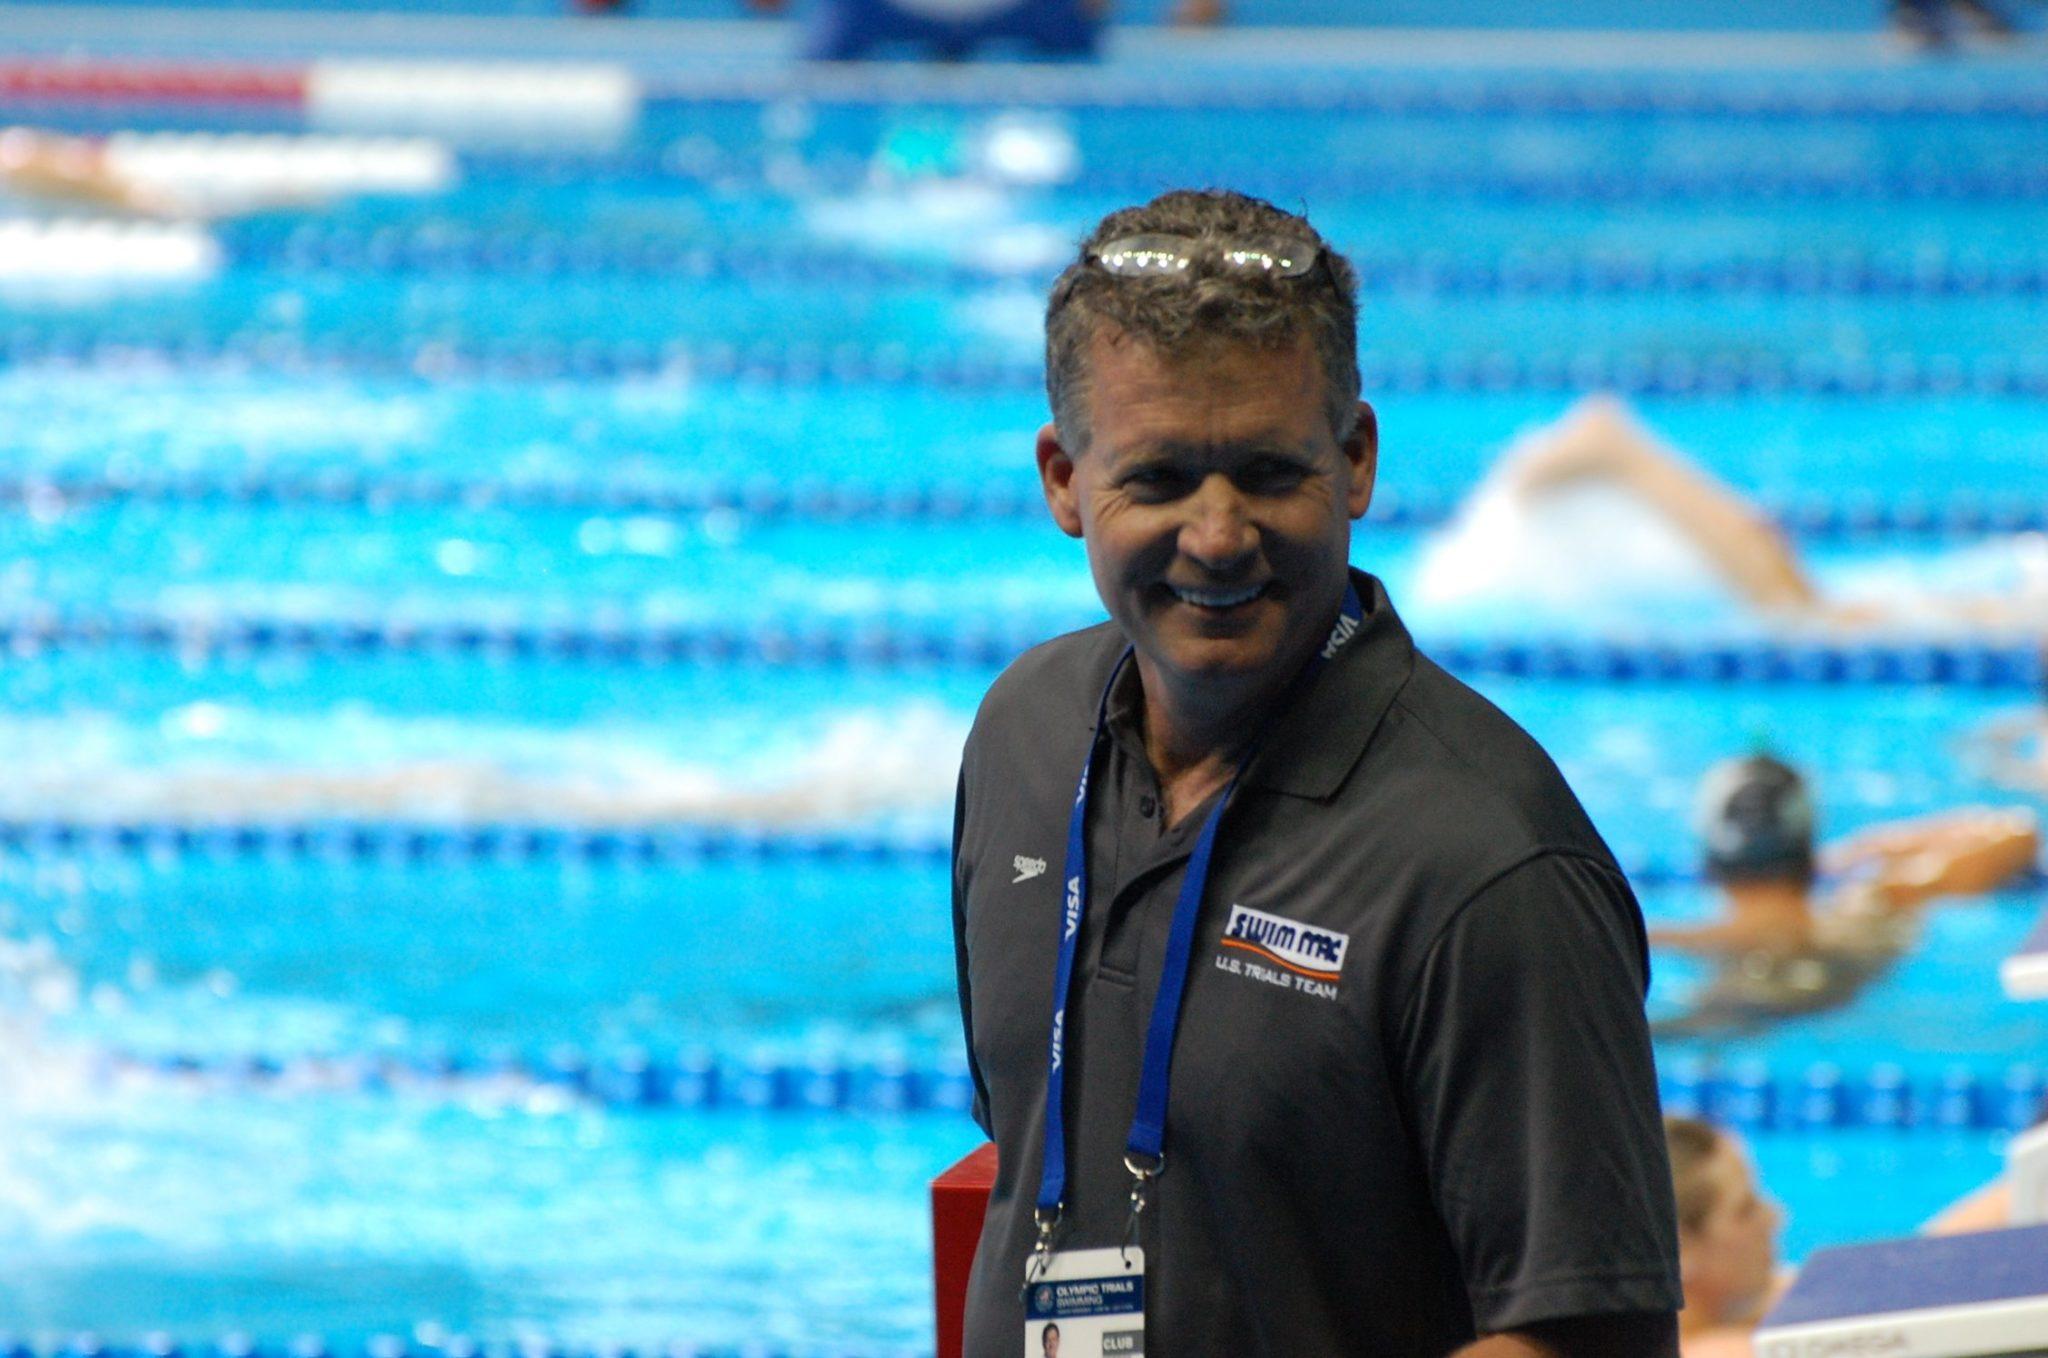 SwimMAC Carolina: Building Champions In Life & In Swimming